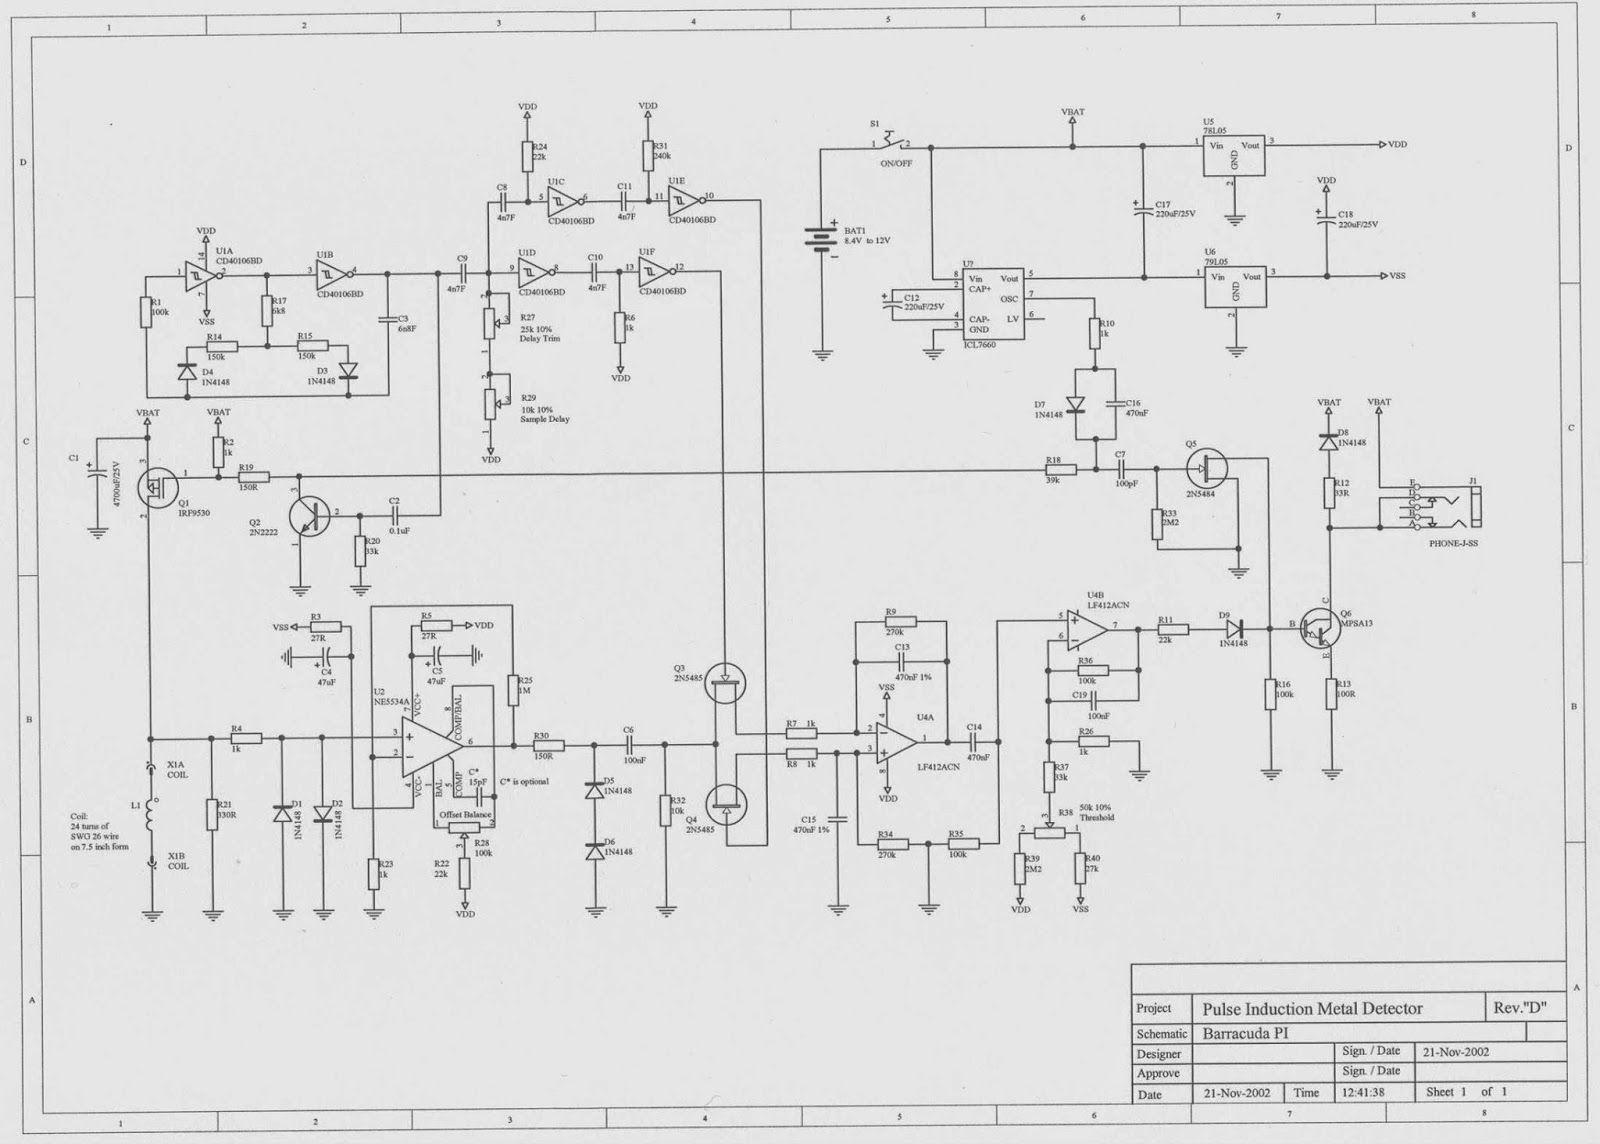 Pin By Gia Mamulashvili On Technology Pinterest Metal Simple Oscillator Pipe Locator Circuit Diagram Detector De